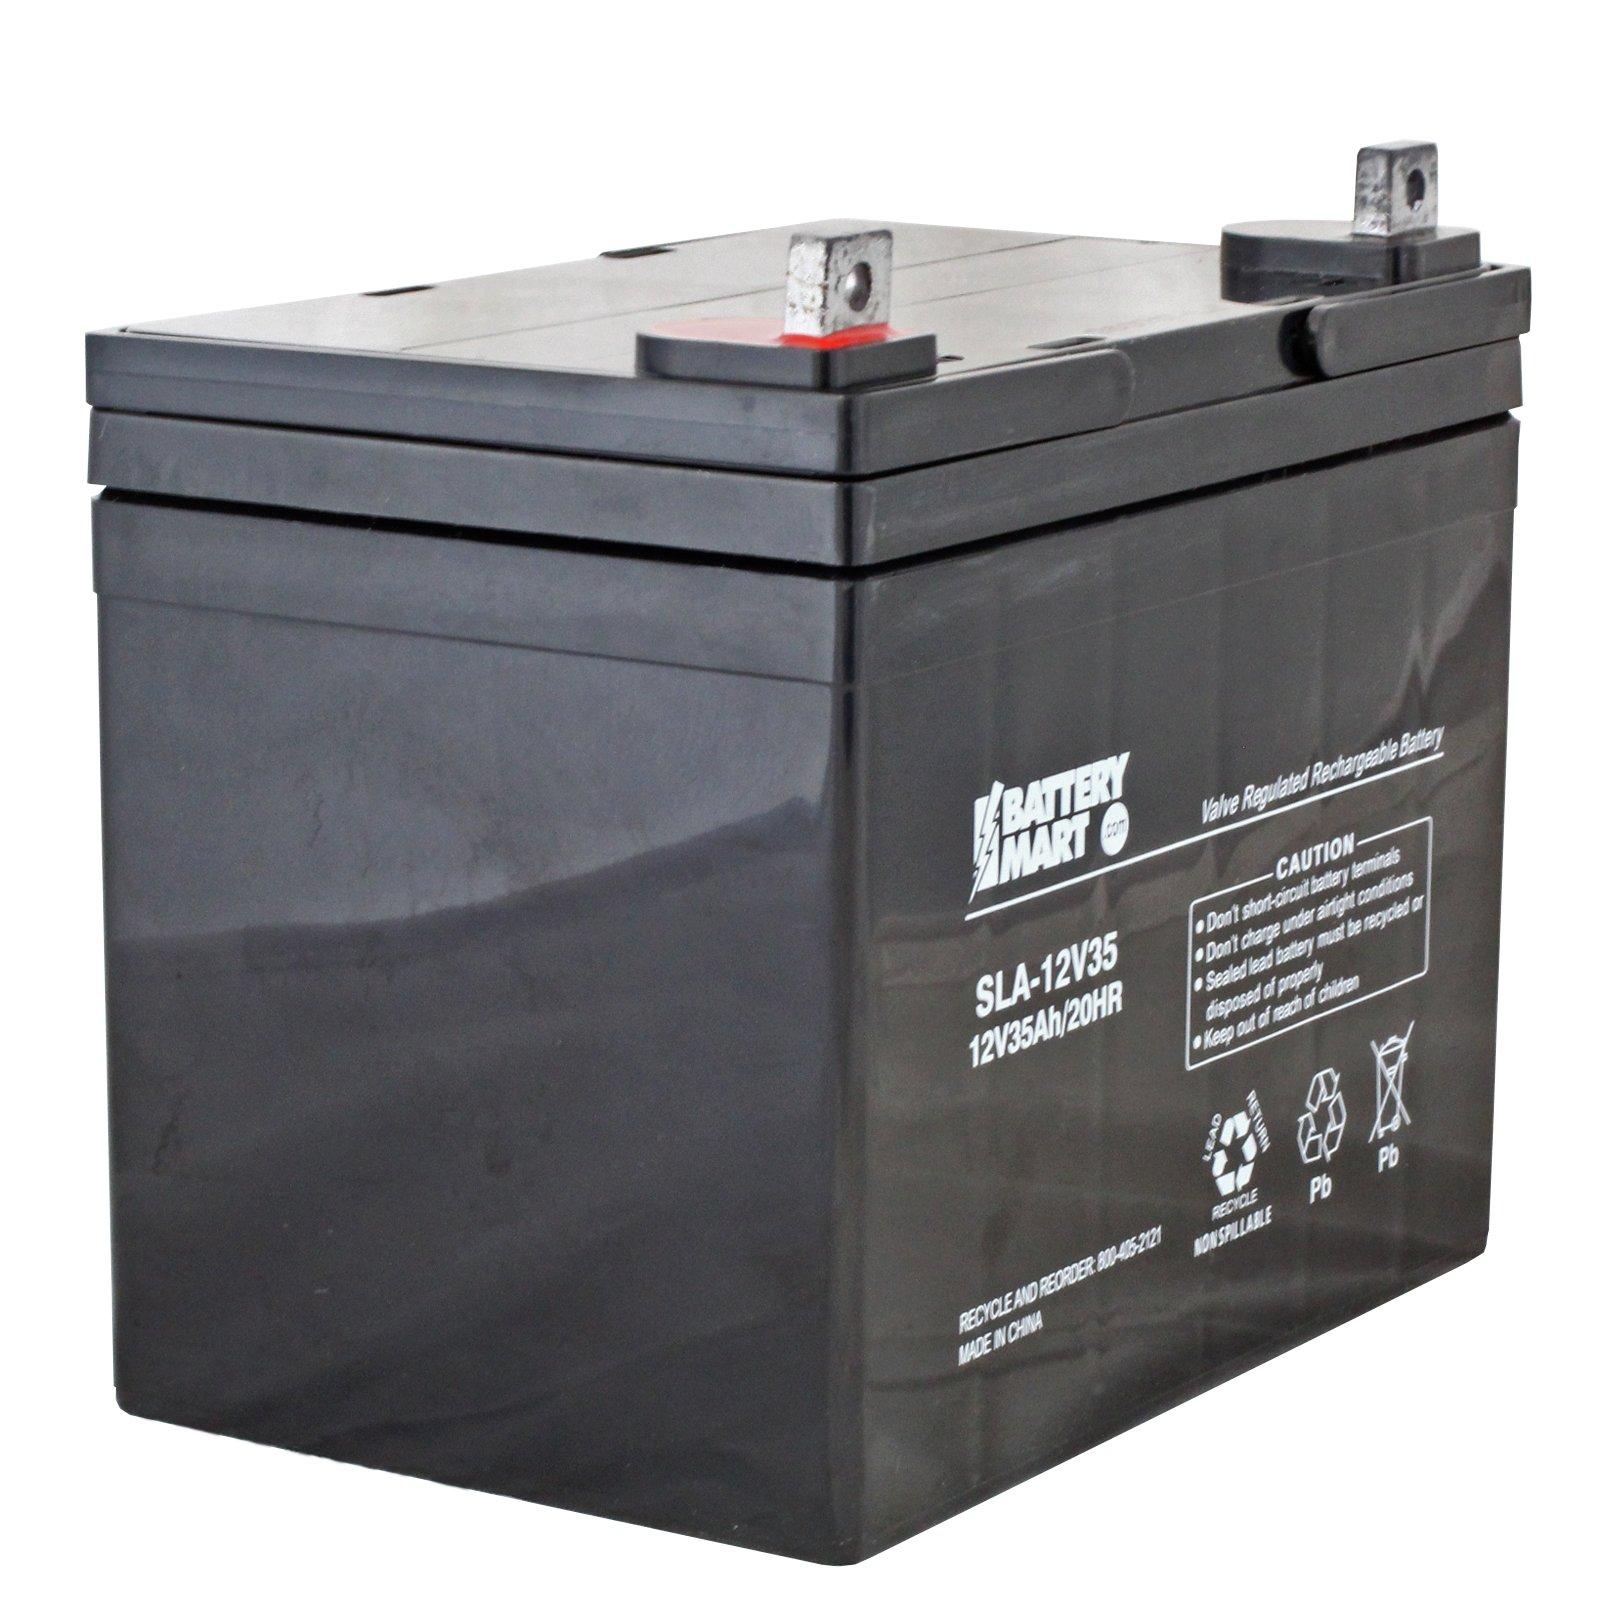 12 Volt 35 Ah Agm Sealed Lead Acid Rechargeable Battery